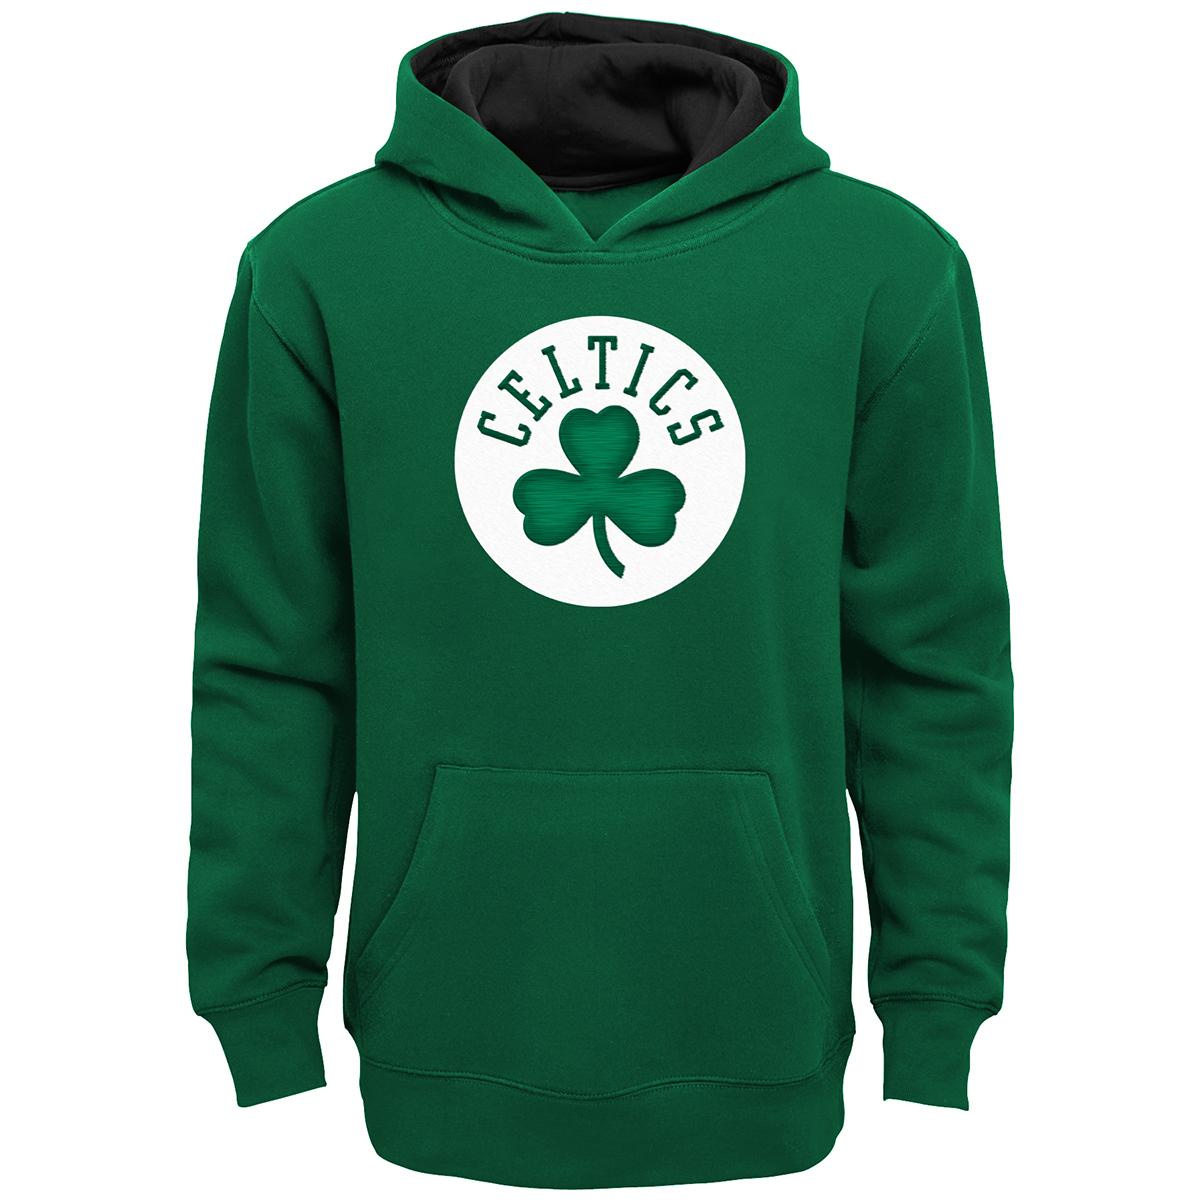 Boston Celtics Boys' Prime Shamrock Pullover Hoodie - Green, XL